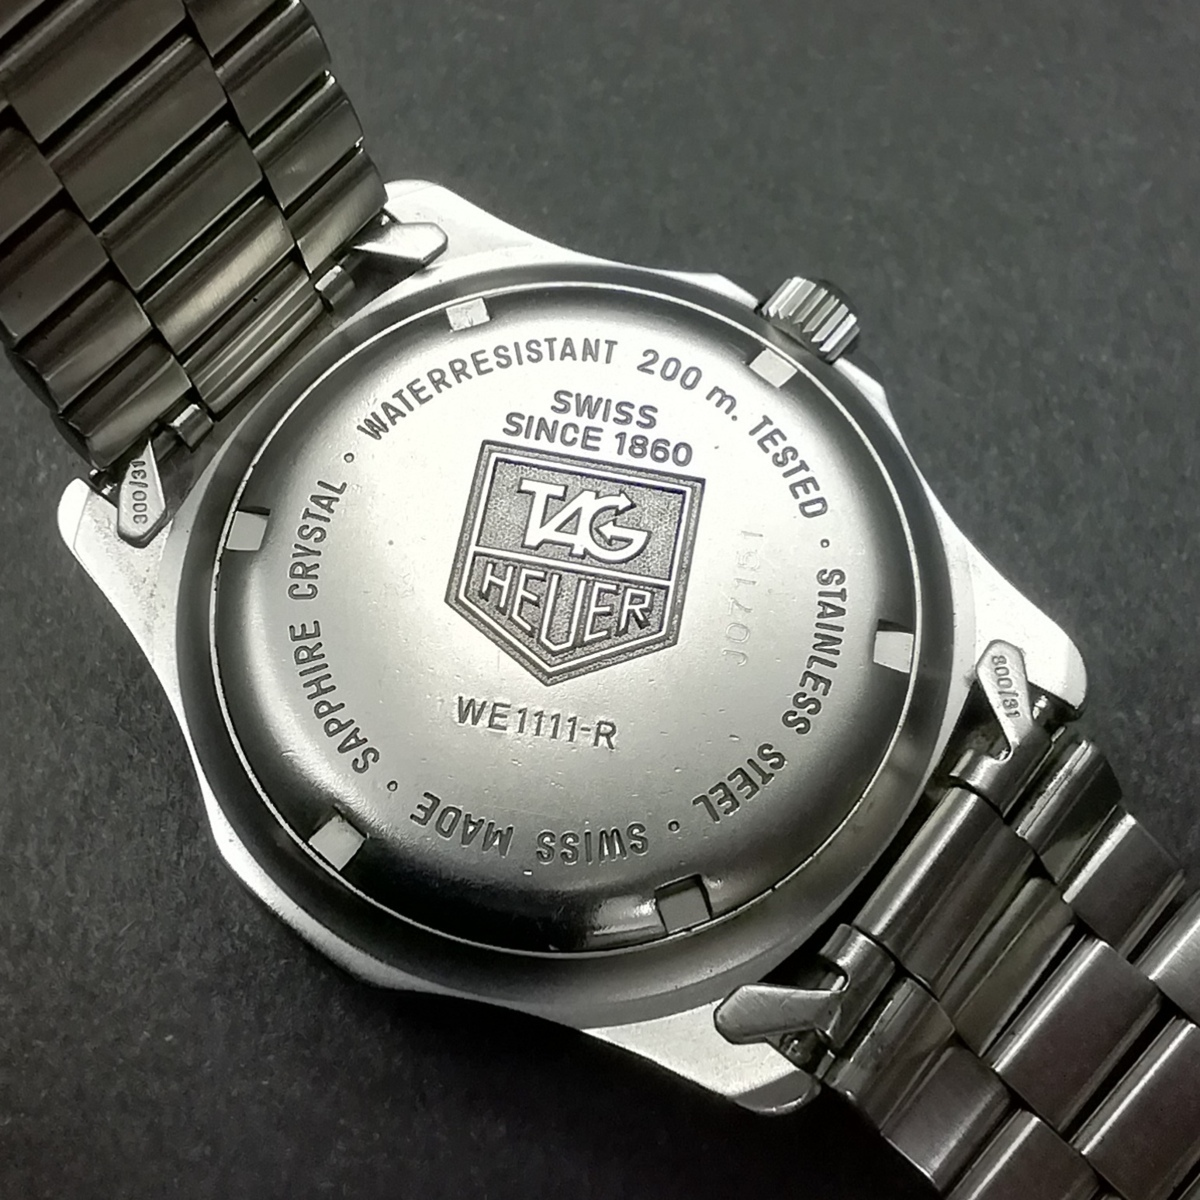 TAG HEUER PROFESSONAL タグホイヤー プロフェッショナル WE111-R クオーツ デイト 200M 元箱/ケース付 メンズ腕時計_画像6